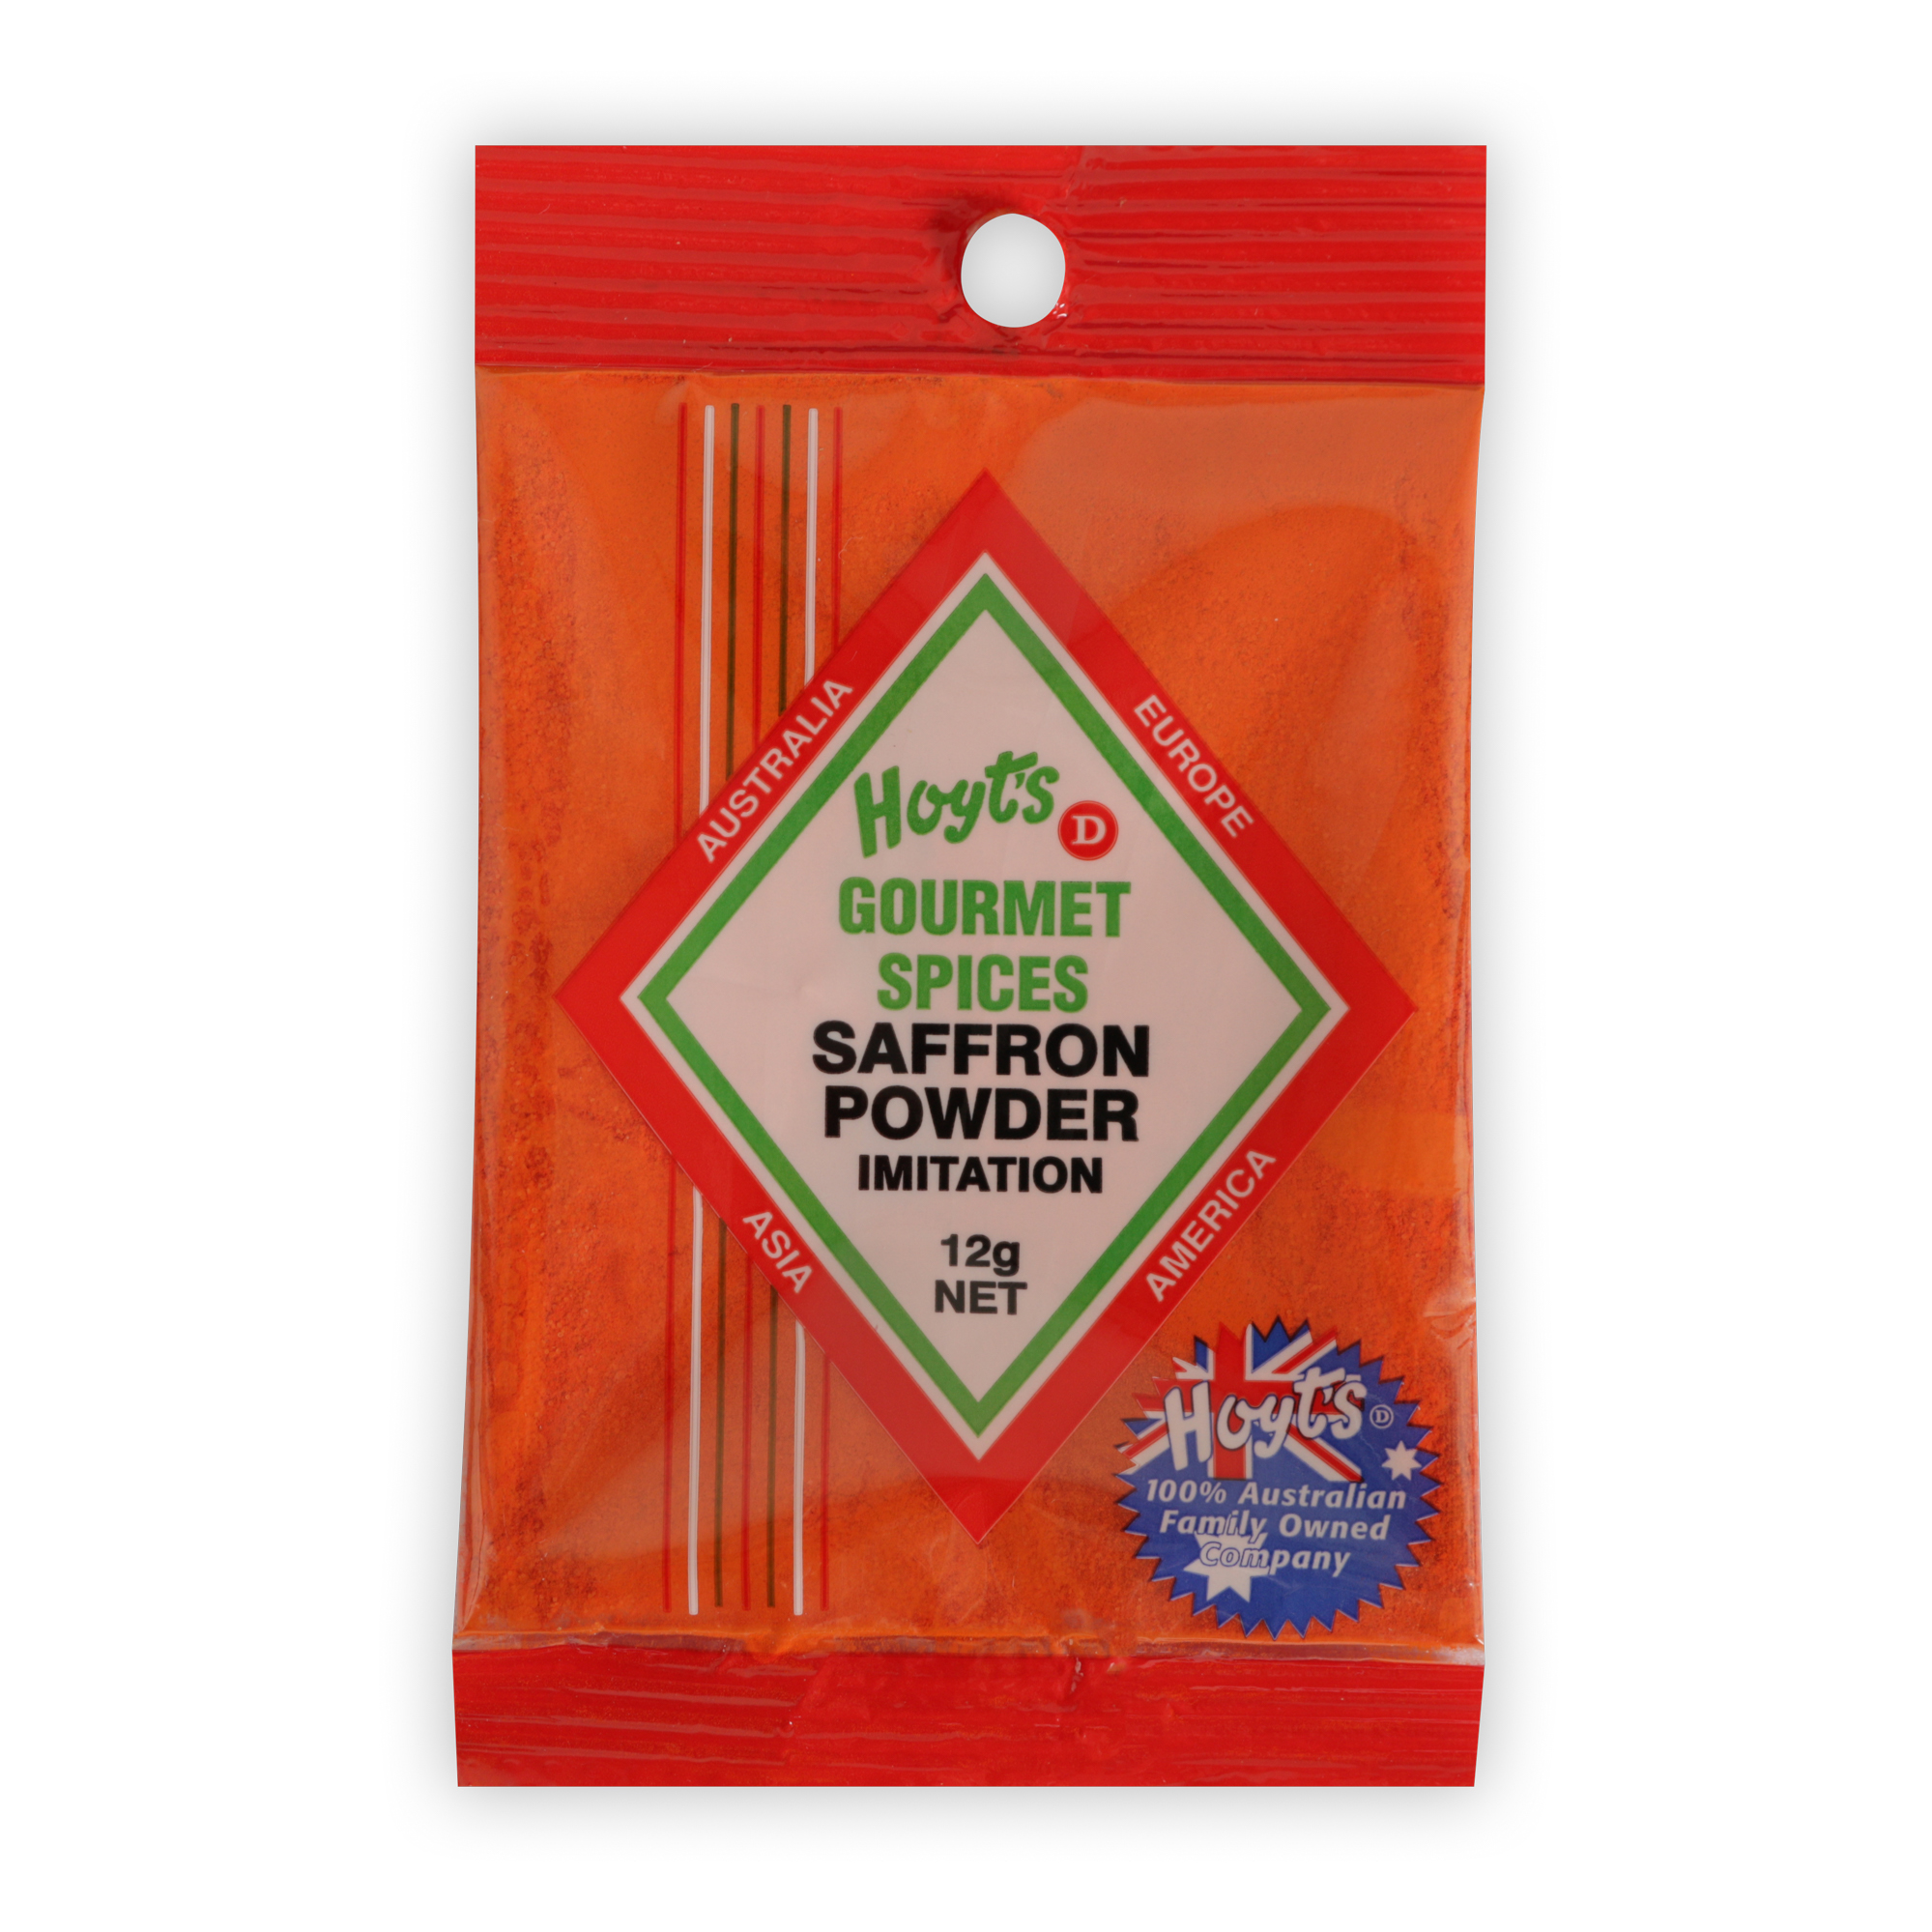 Hoyts Gourmet Saffron Powder 12g